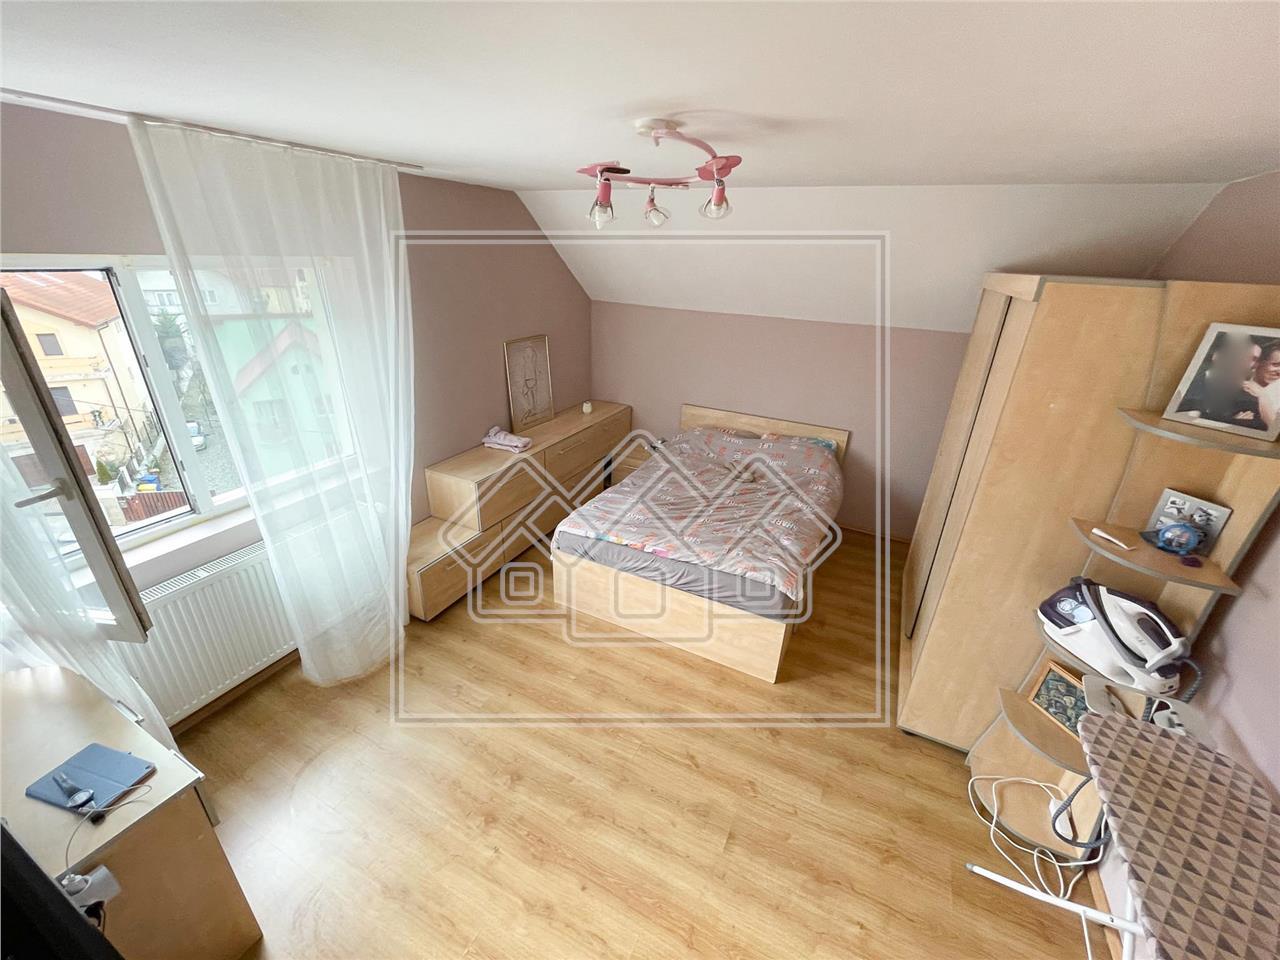 Apartament de vanzare in Sibiu - 3 camere si 2 bai - zona Tilisca